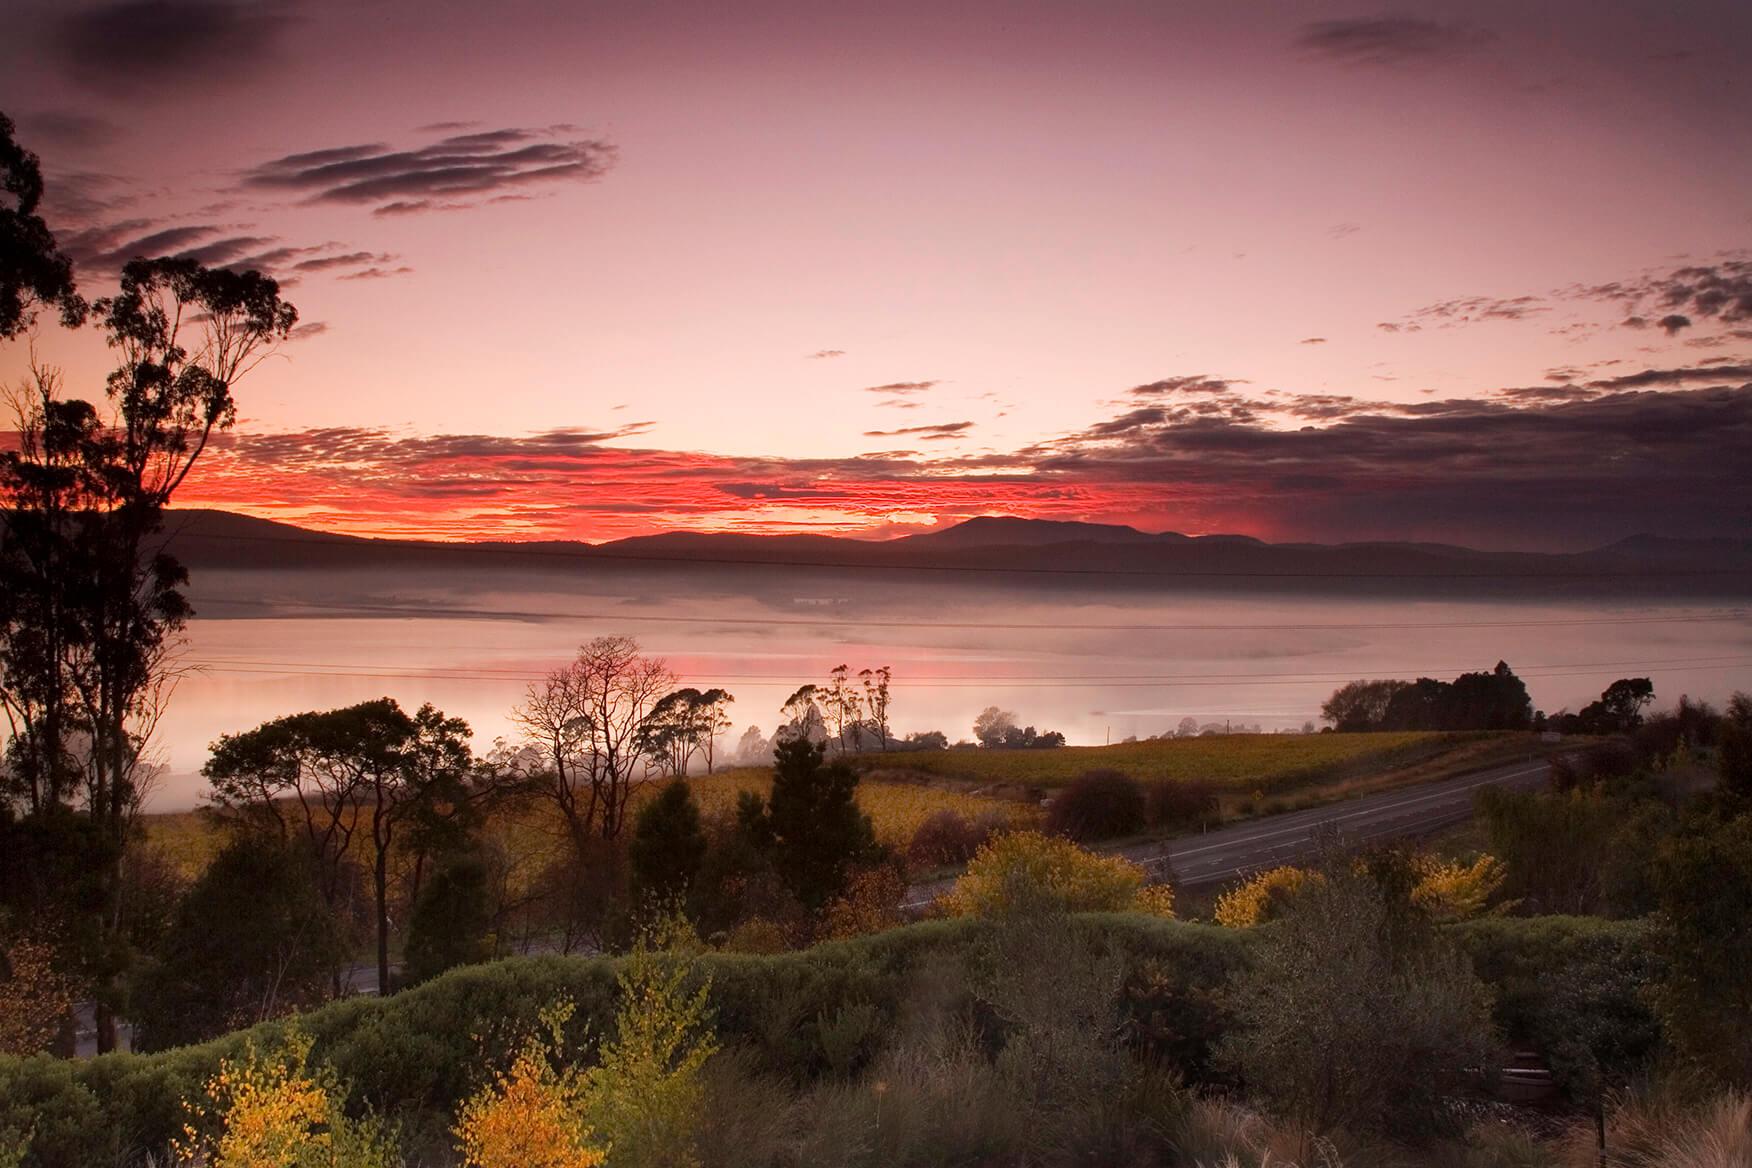 Sunrise-on-Tamar-River-1.jpg